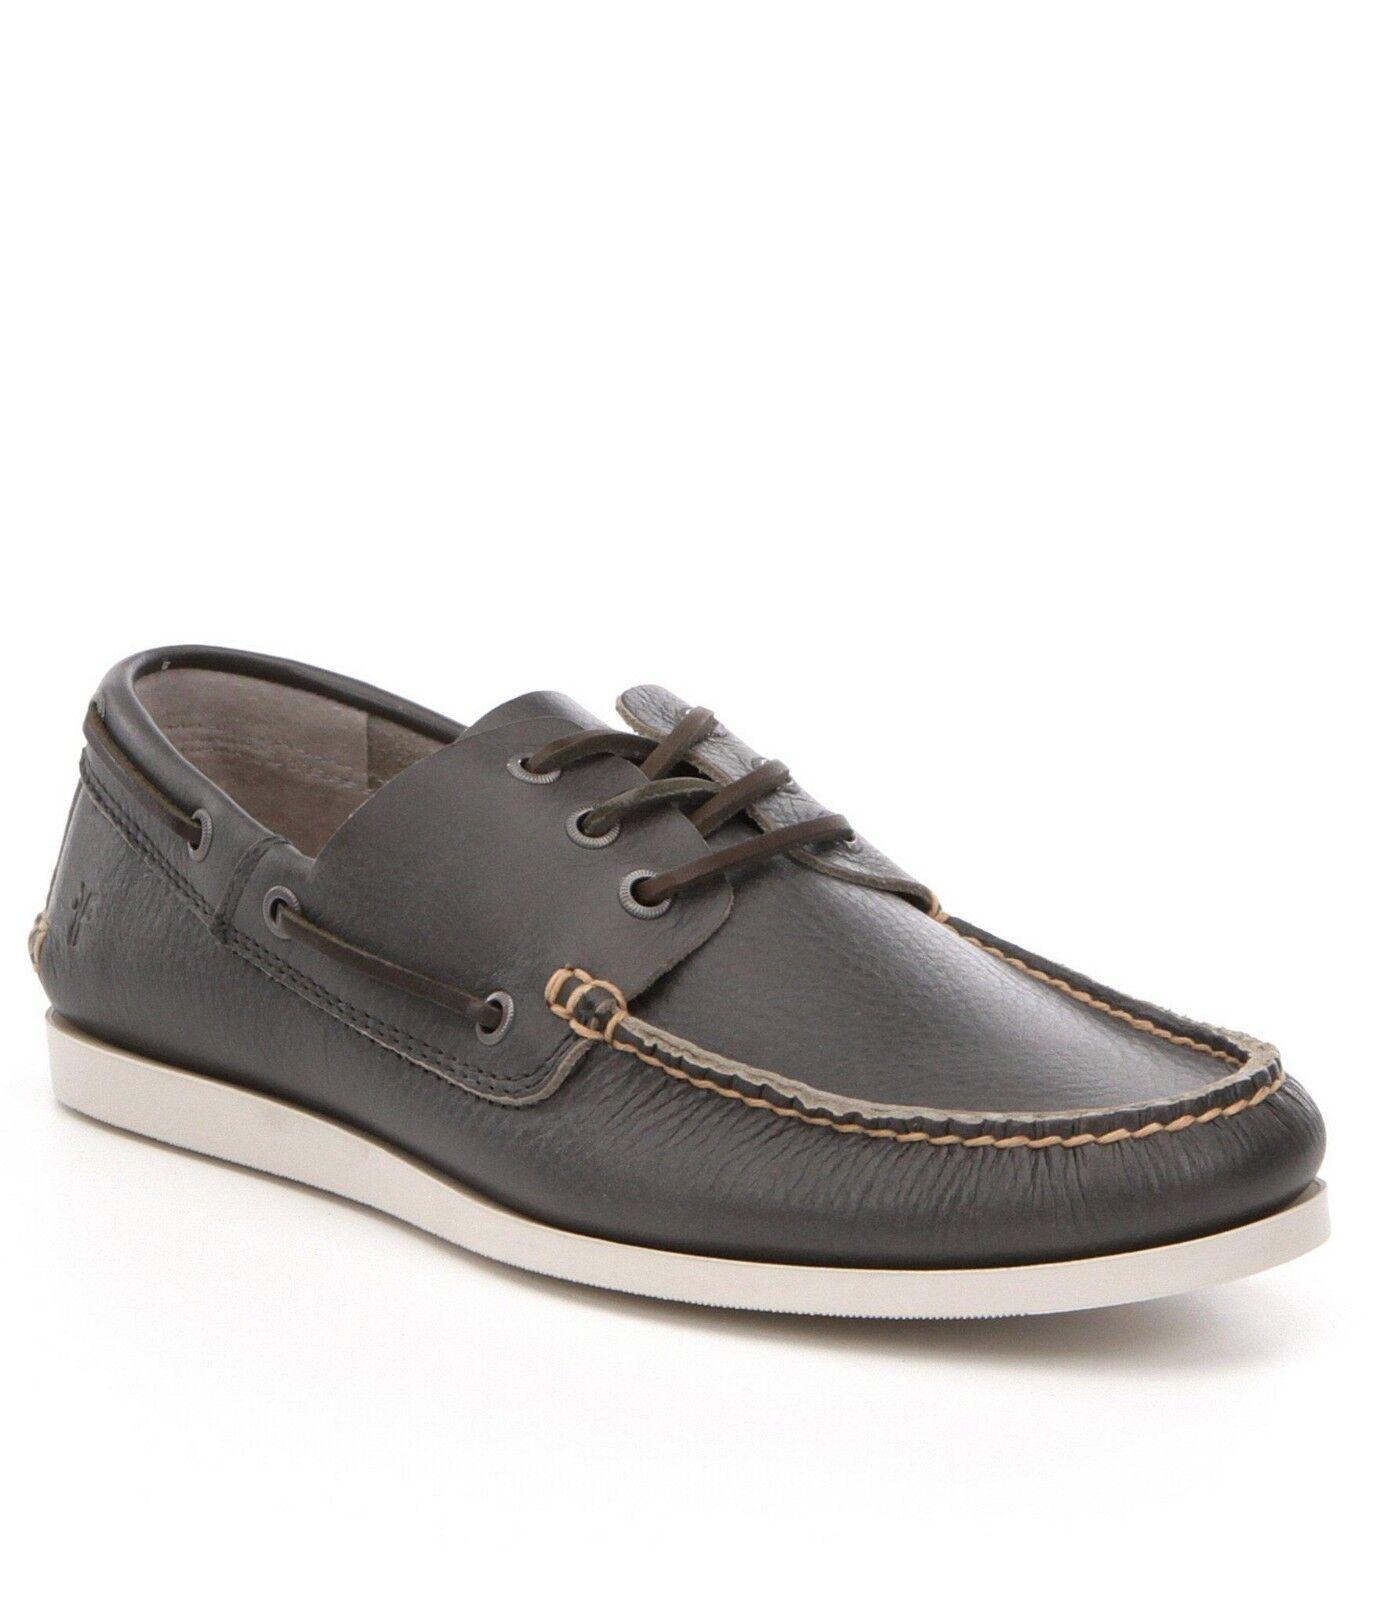 Mens Frye Briggs Boat shoes Leather Loafer Slate Grey Slip On shoes 8 9.5 10 11